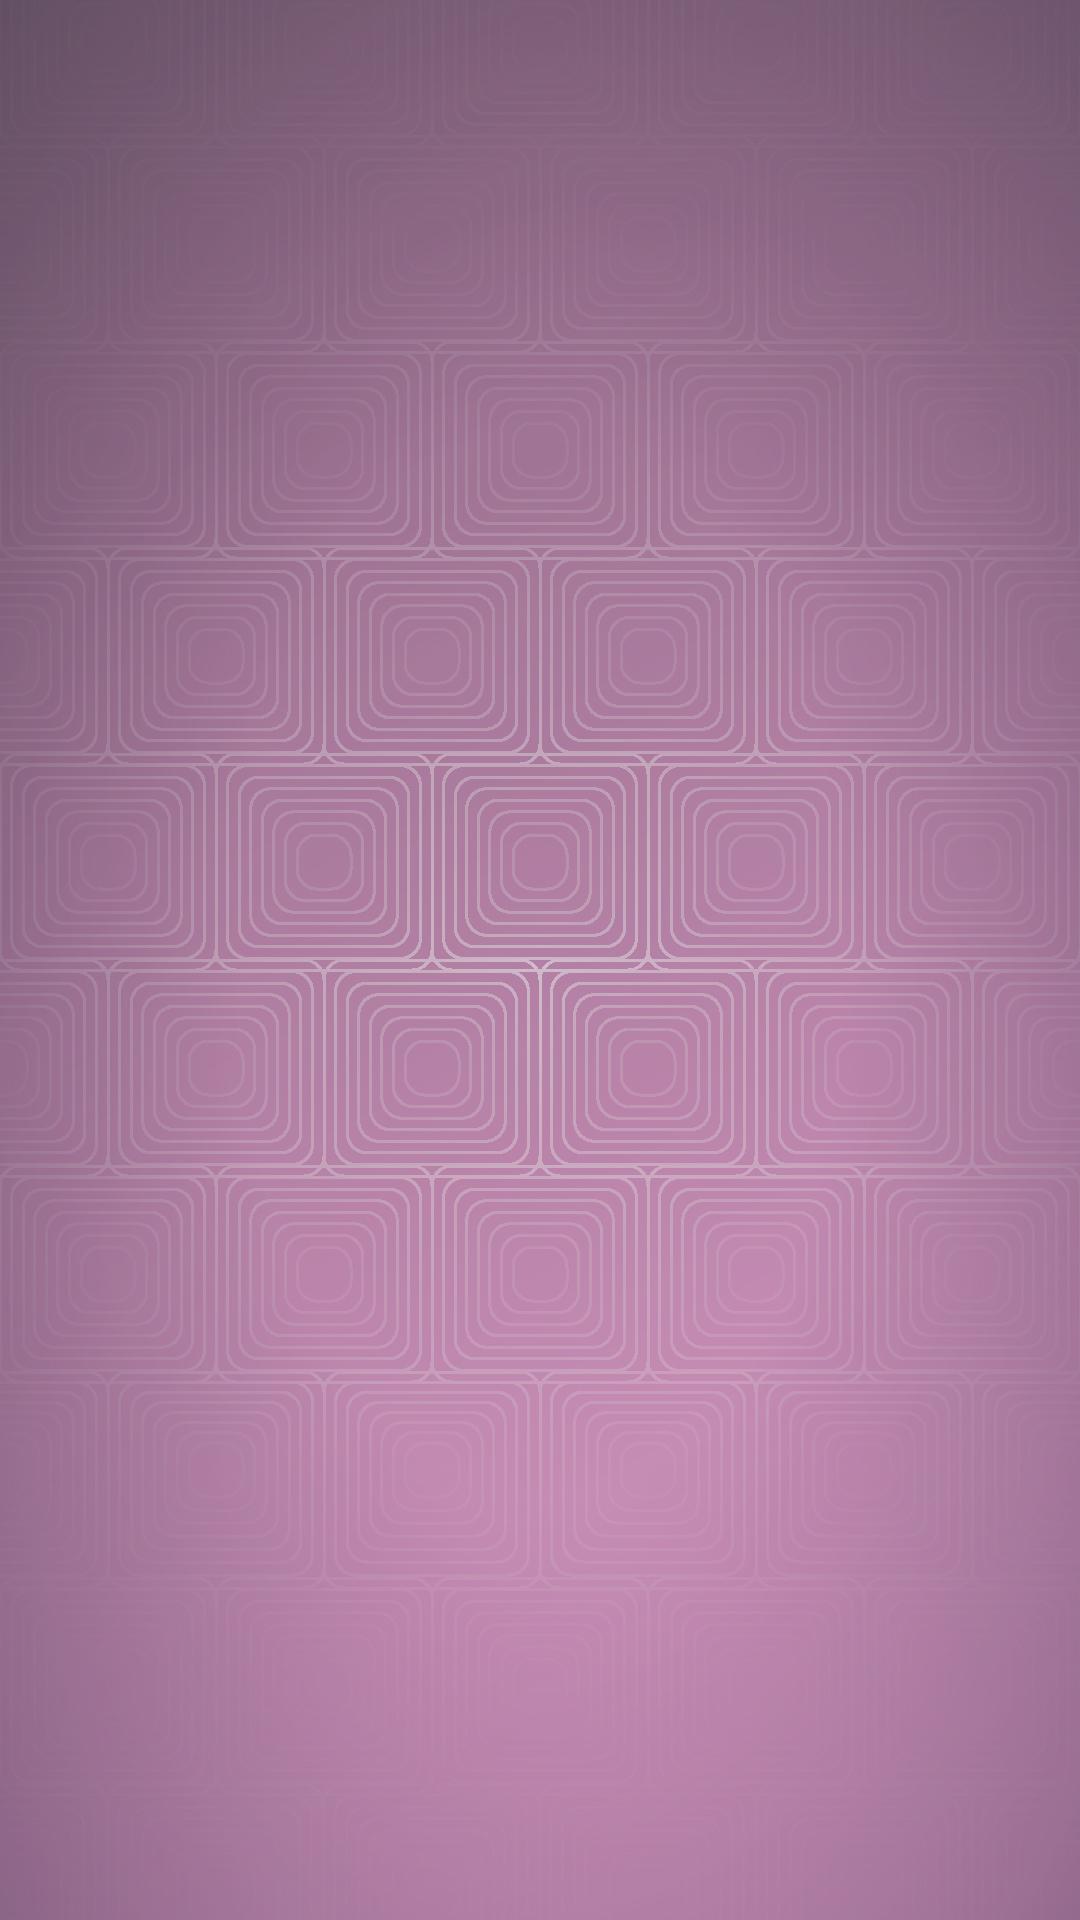 Pattern Gradation Square Pink Wallpapersc Smartphone